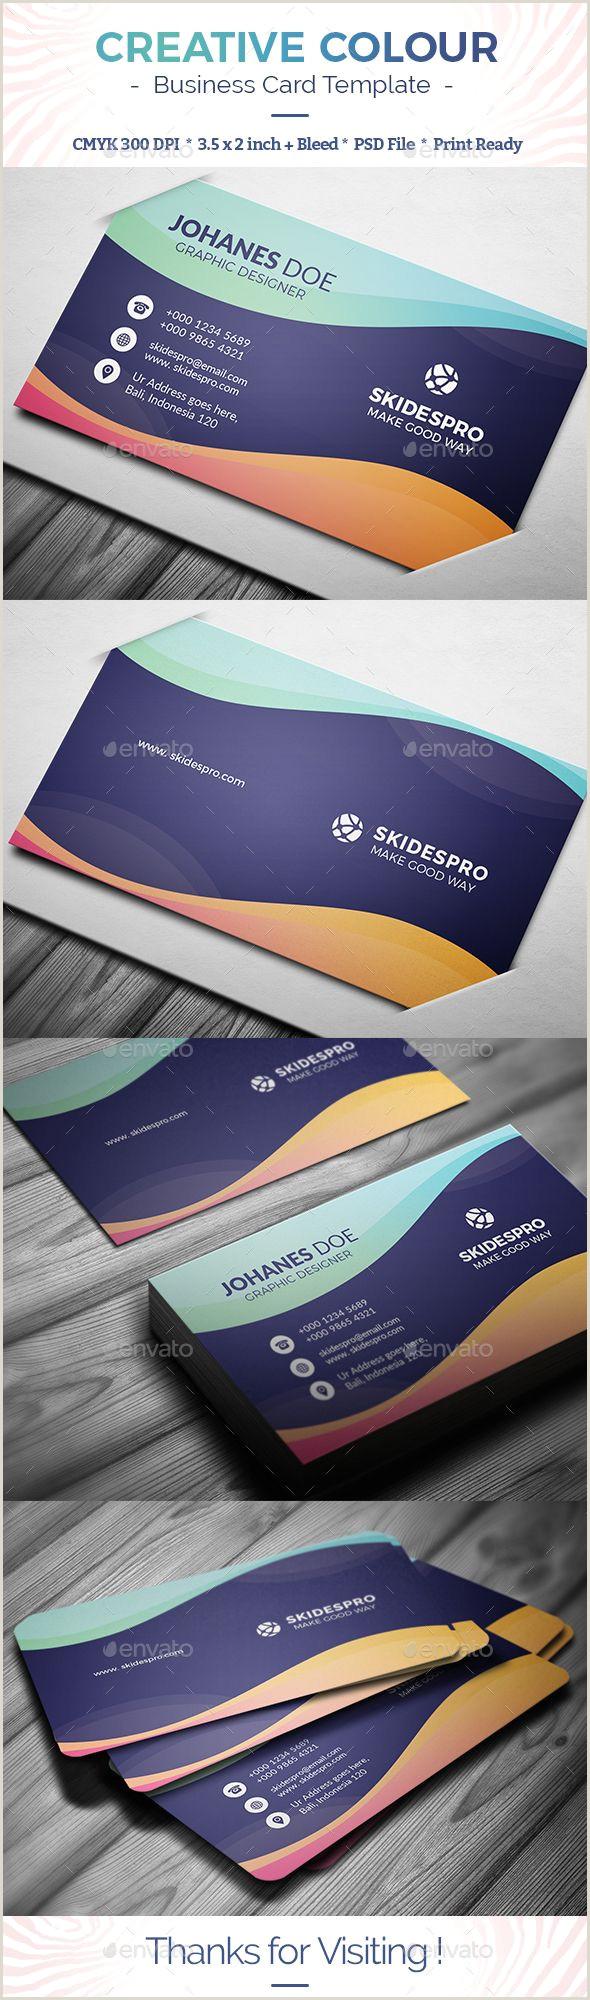 2 Color Business Cards Creative Colour Business Cards Print Templates